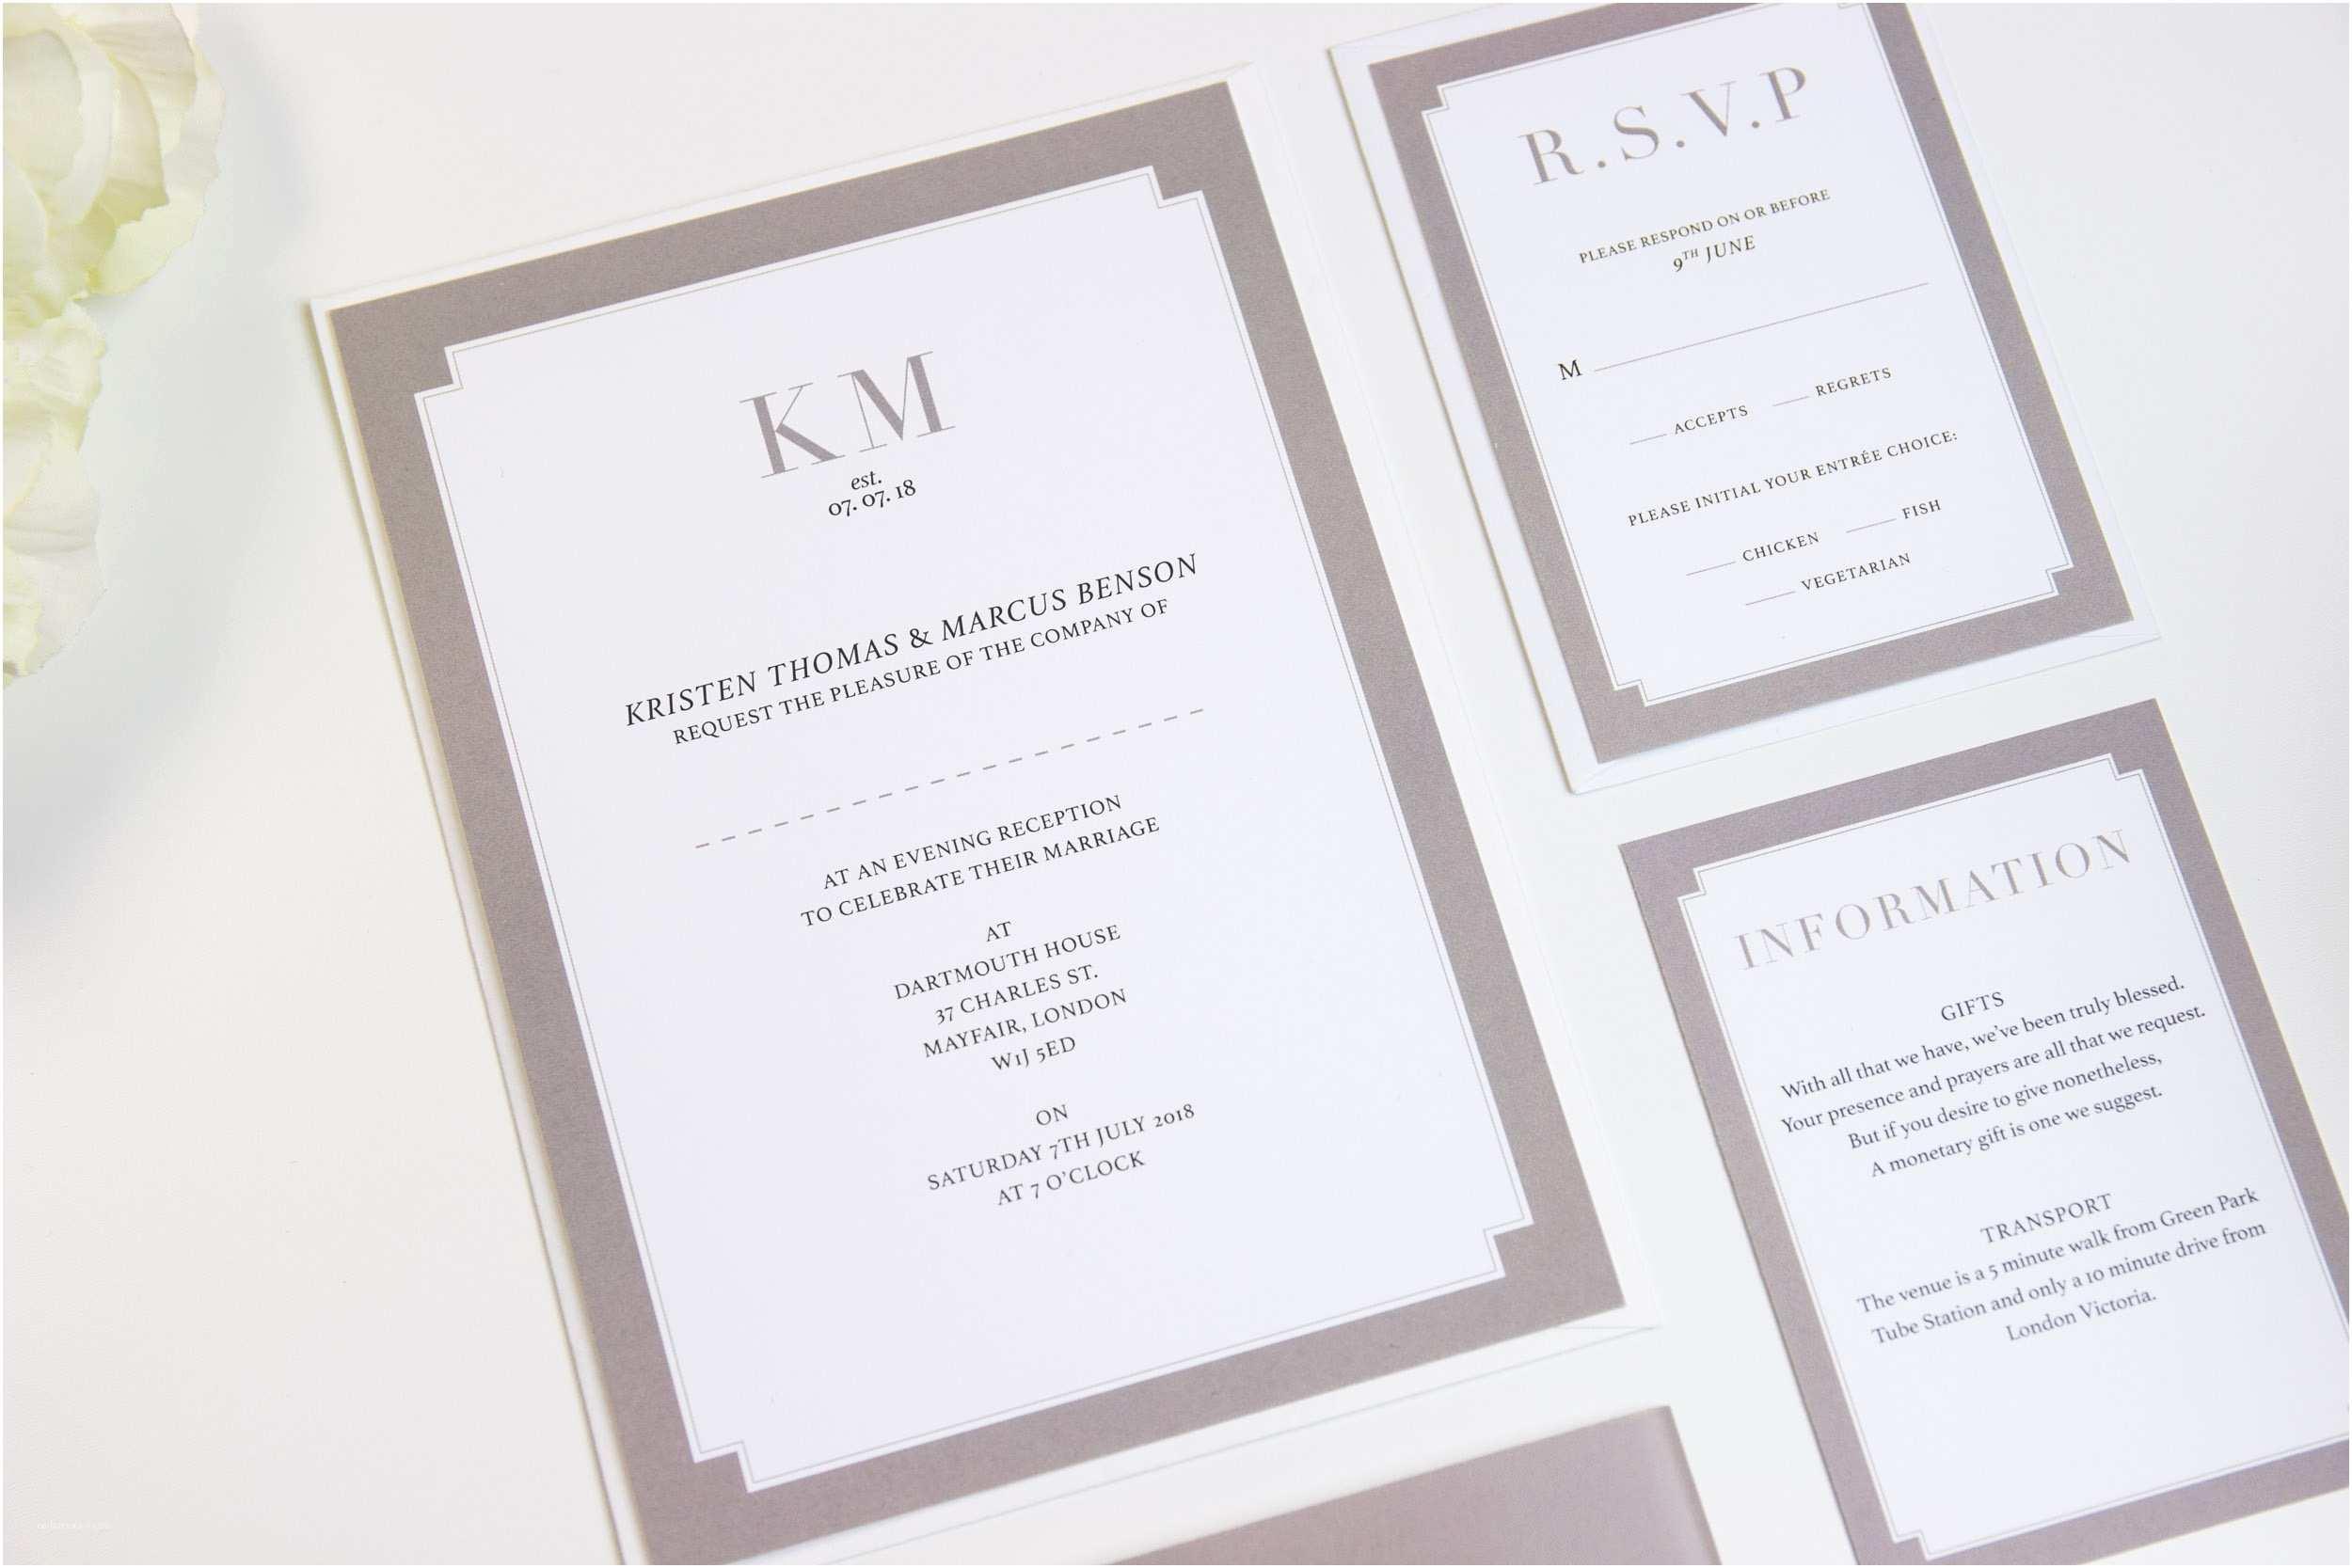 Classy Wedding Invitations Free Elegant Wedding Invitation Borders Matik for